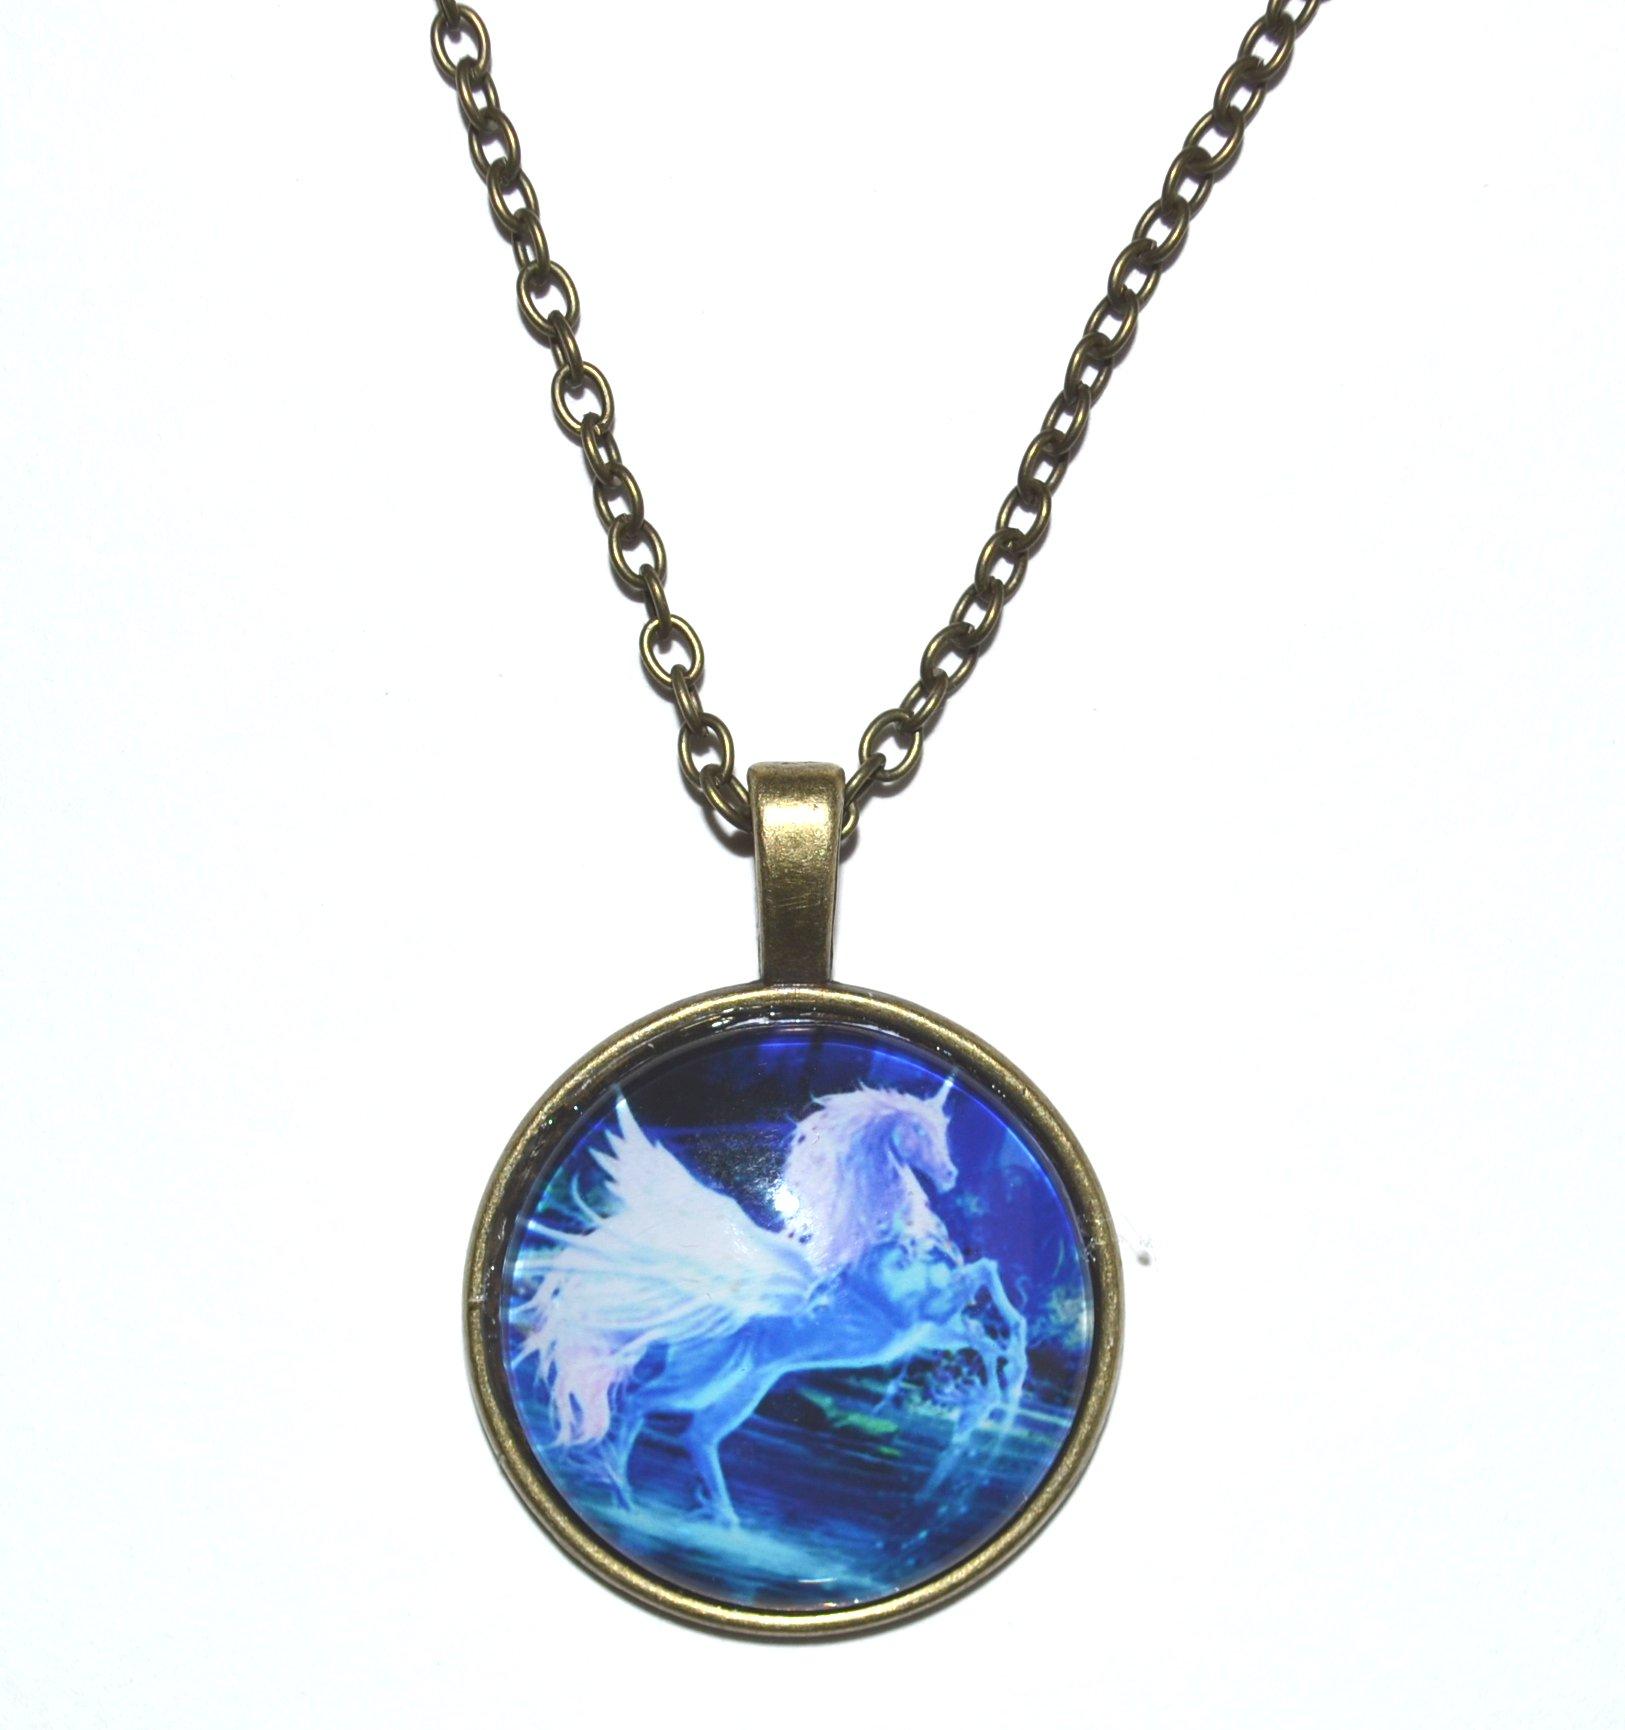 Magical Unicorn Necklace